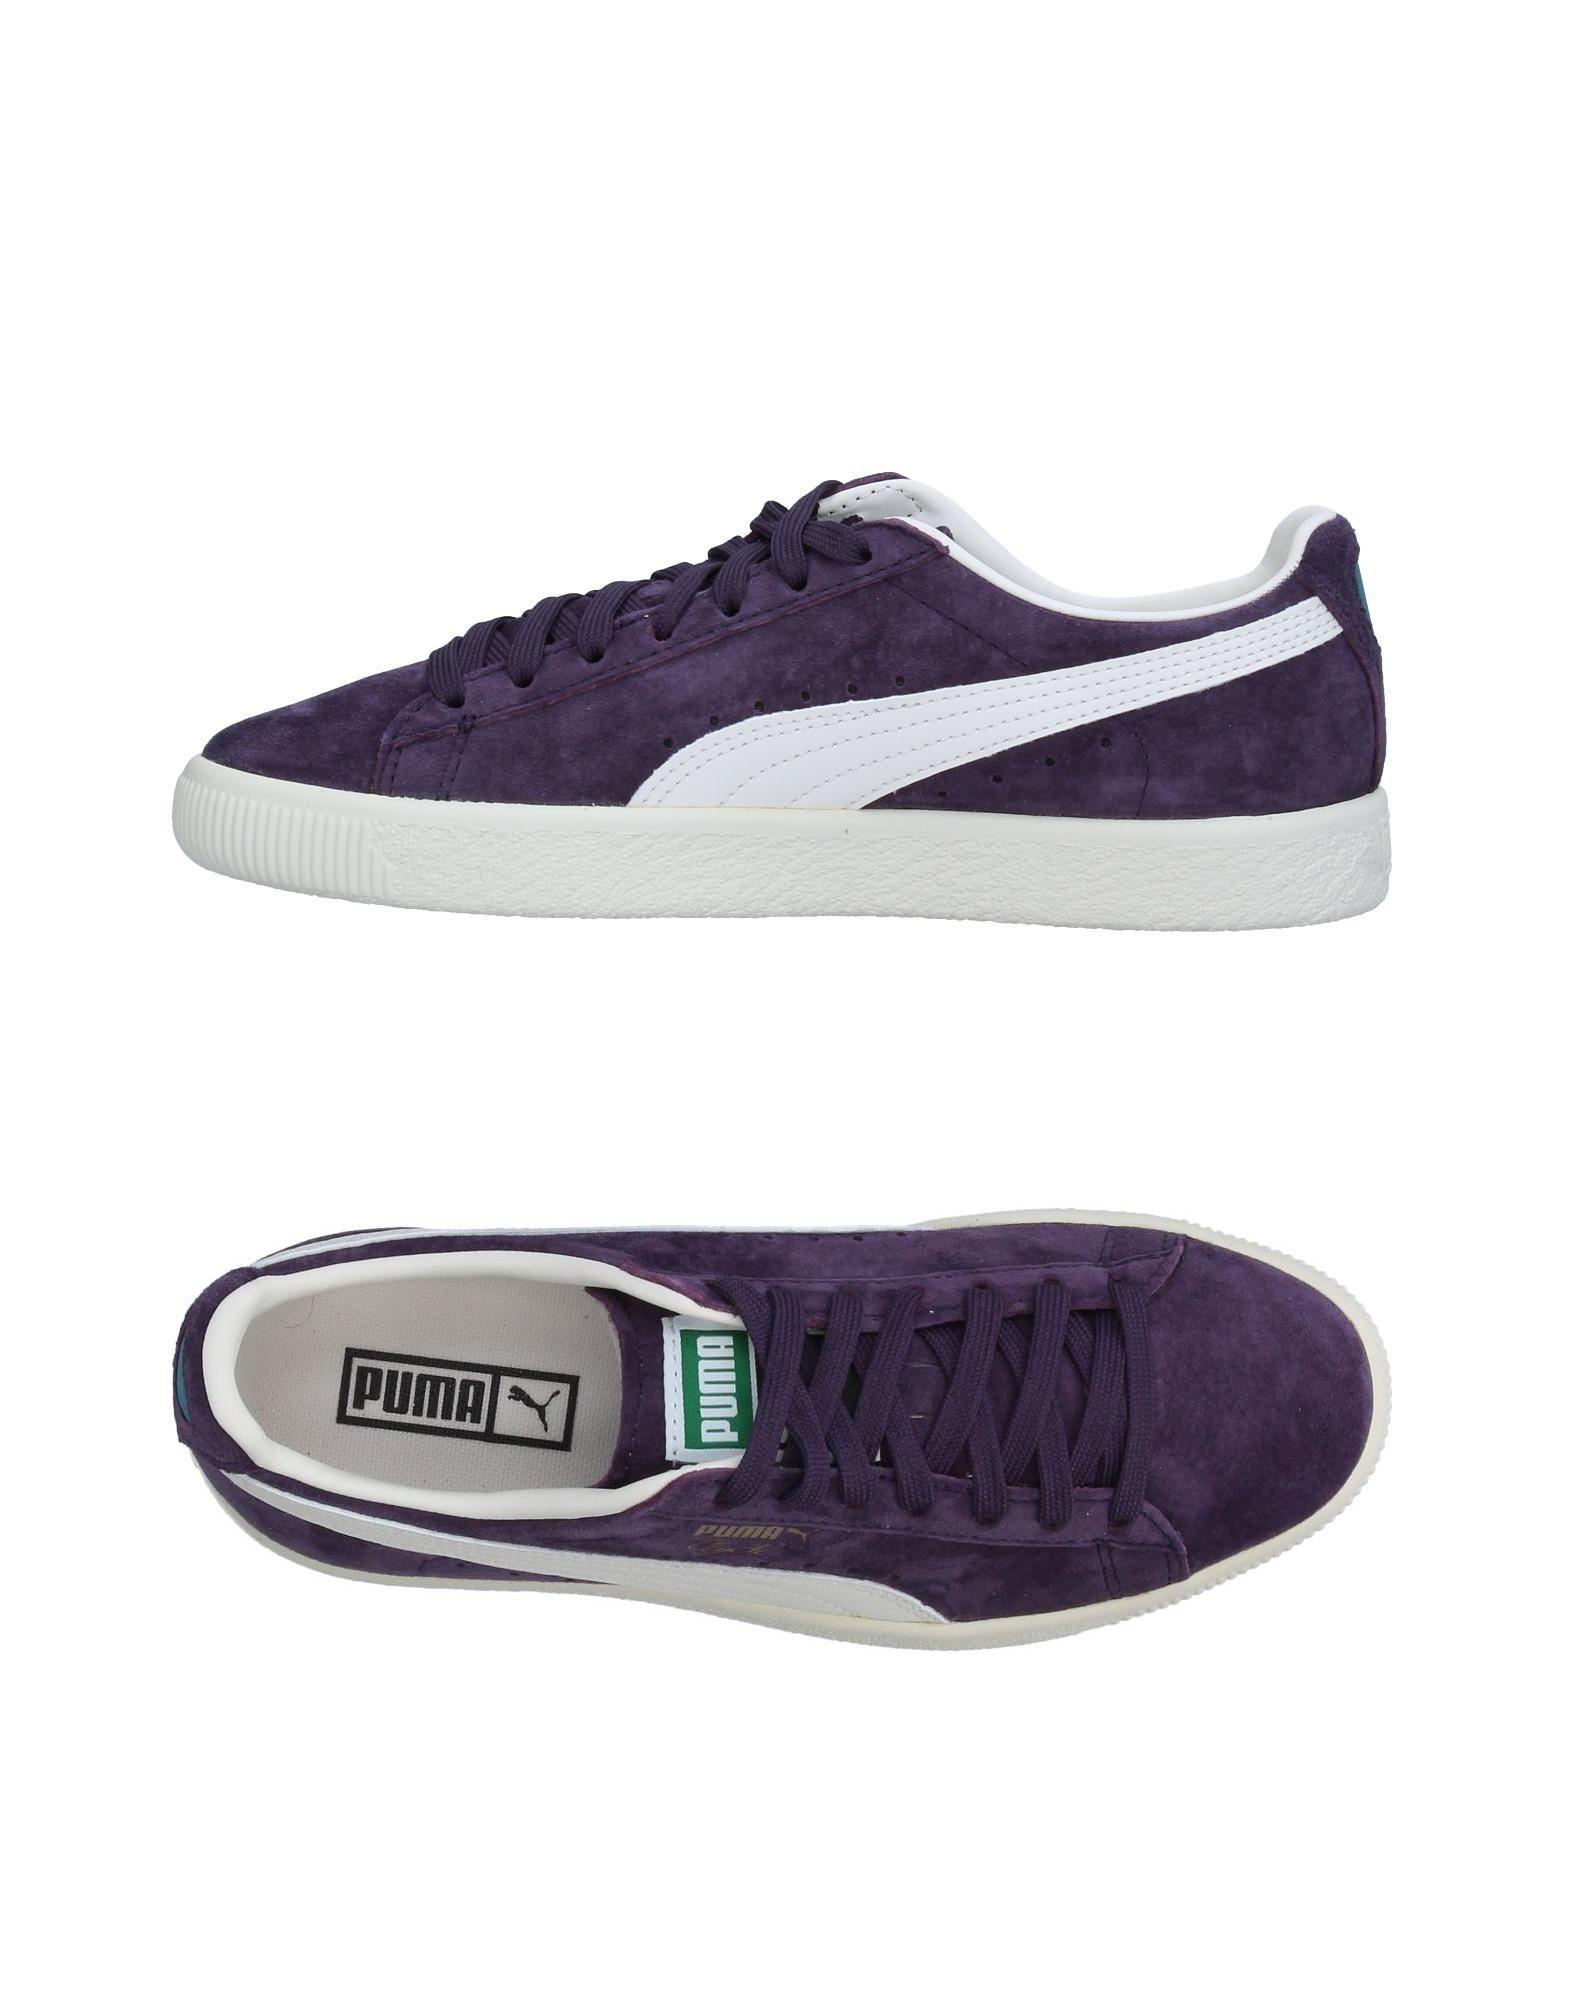 Moda 11326422VG Sneakers Puma Donna - 11326422VG Moda f26a47